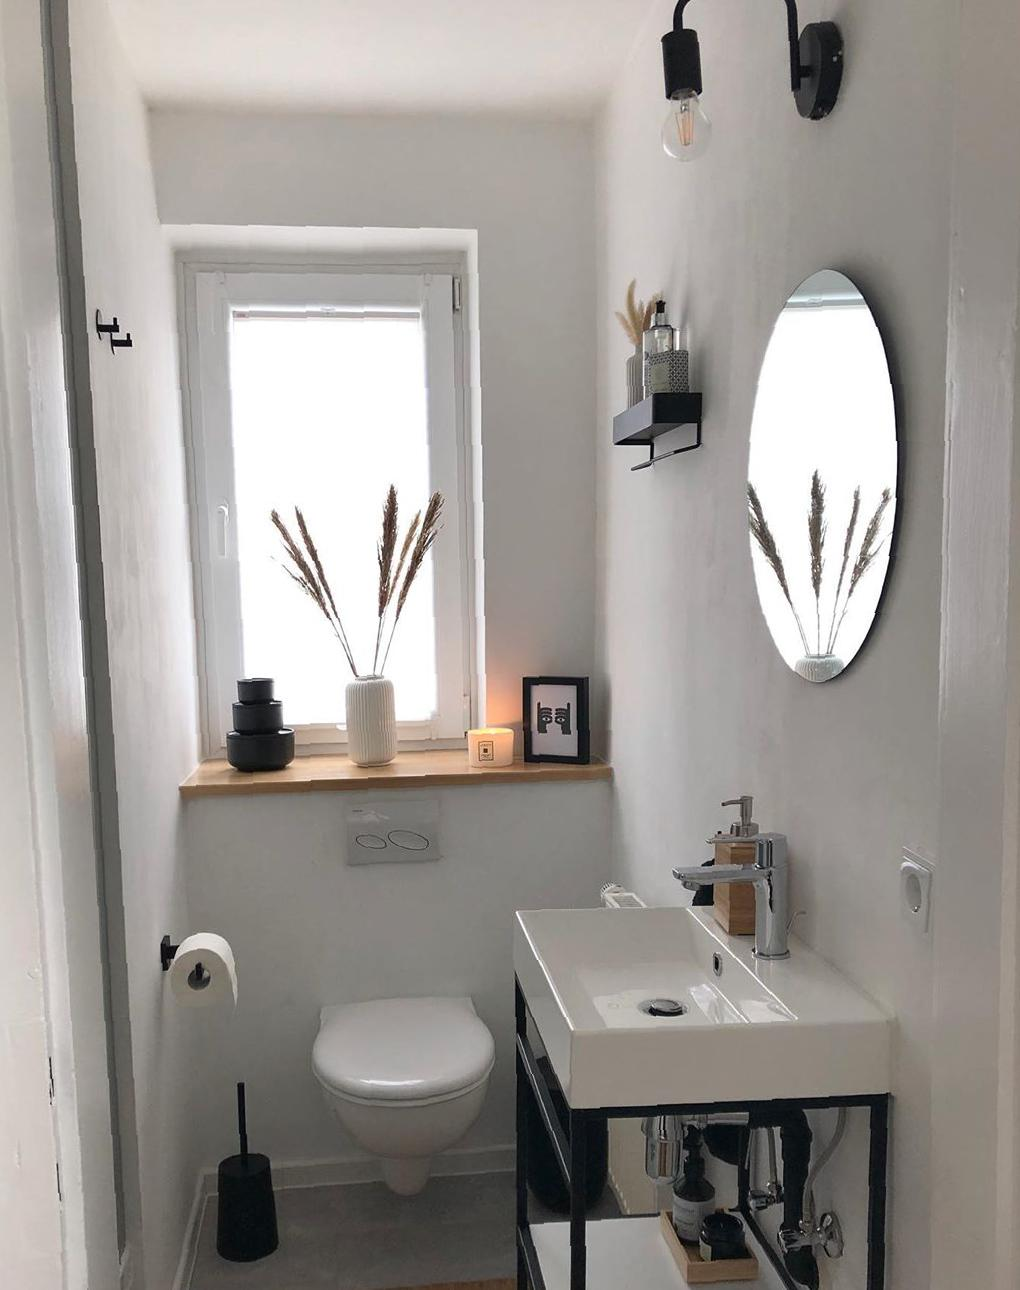 Best Basin Design Images for Your Stylist Home basin, basin ideas, bathroom basin, basin images, basin design